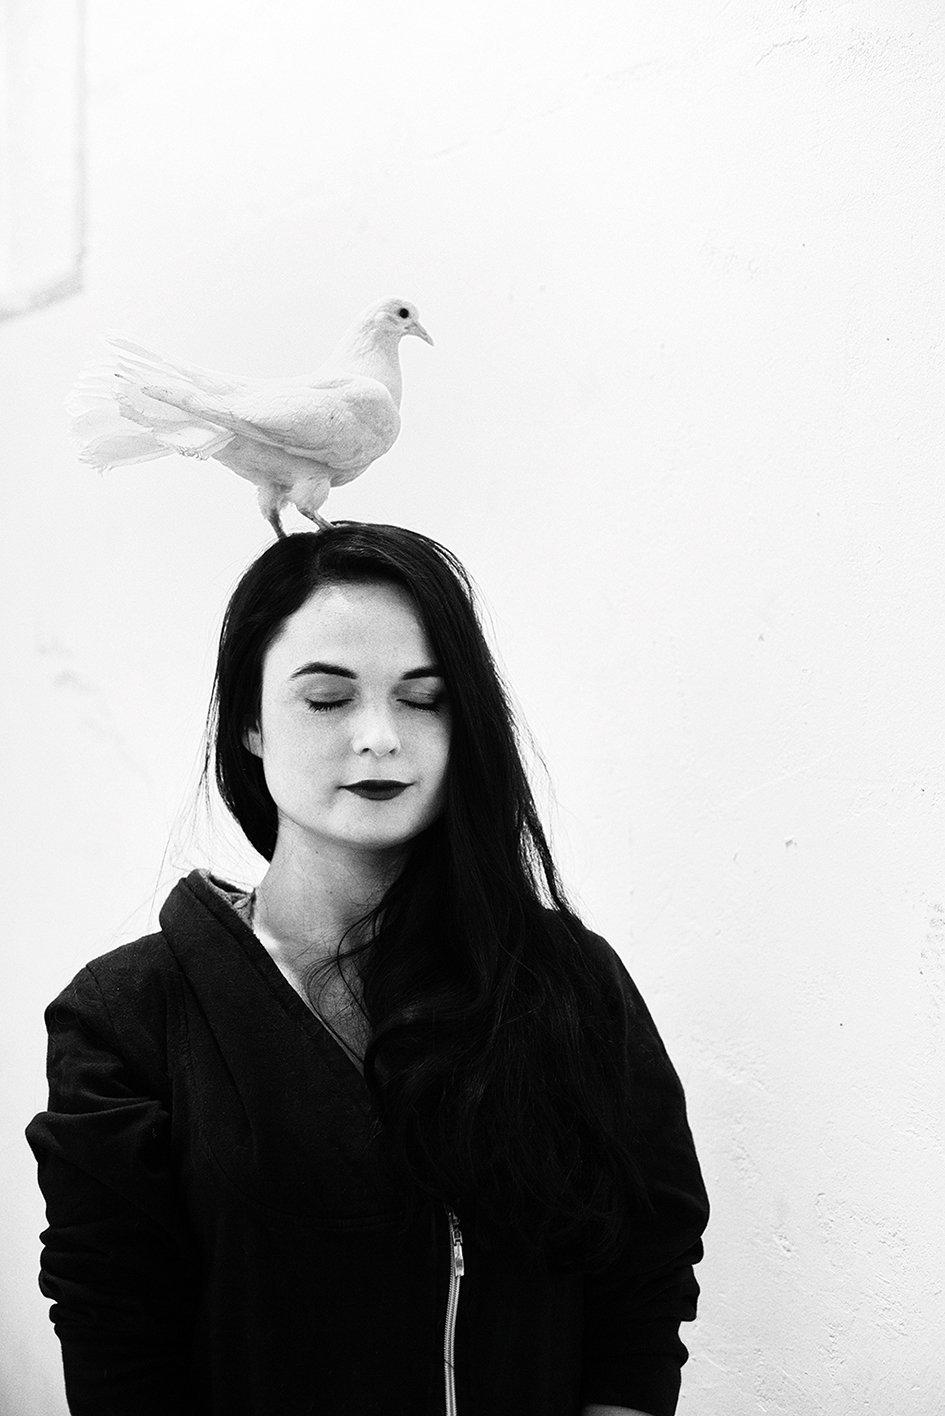 lucja_romanowska.jpg